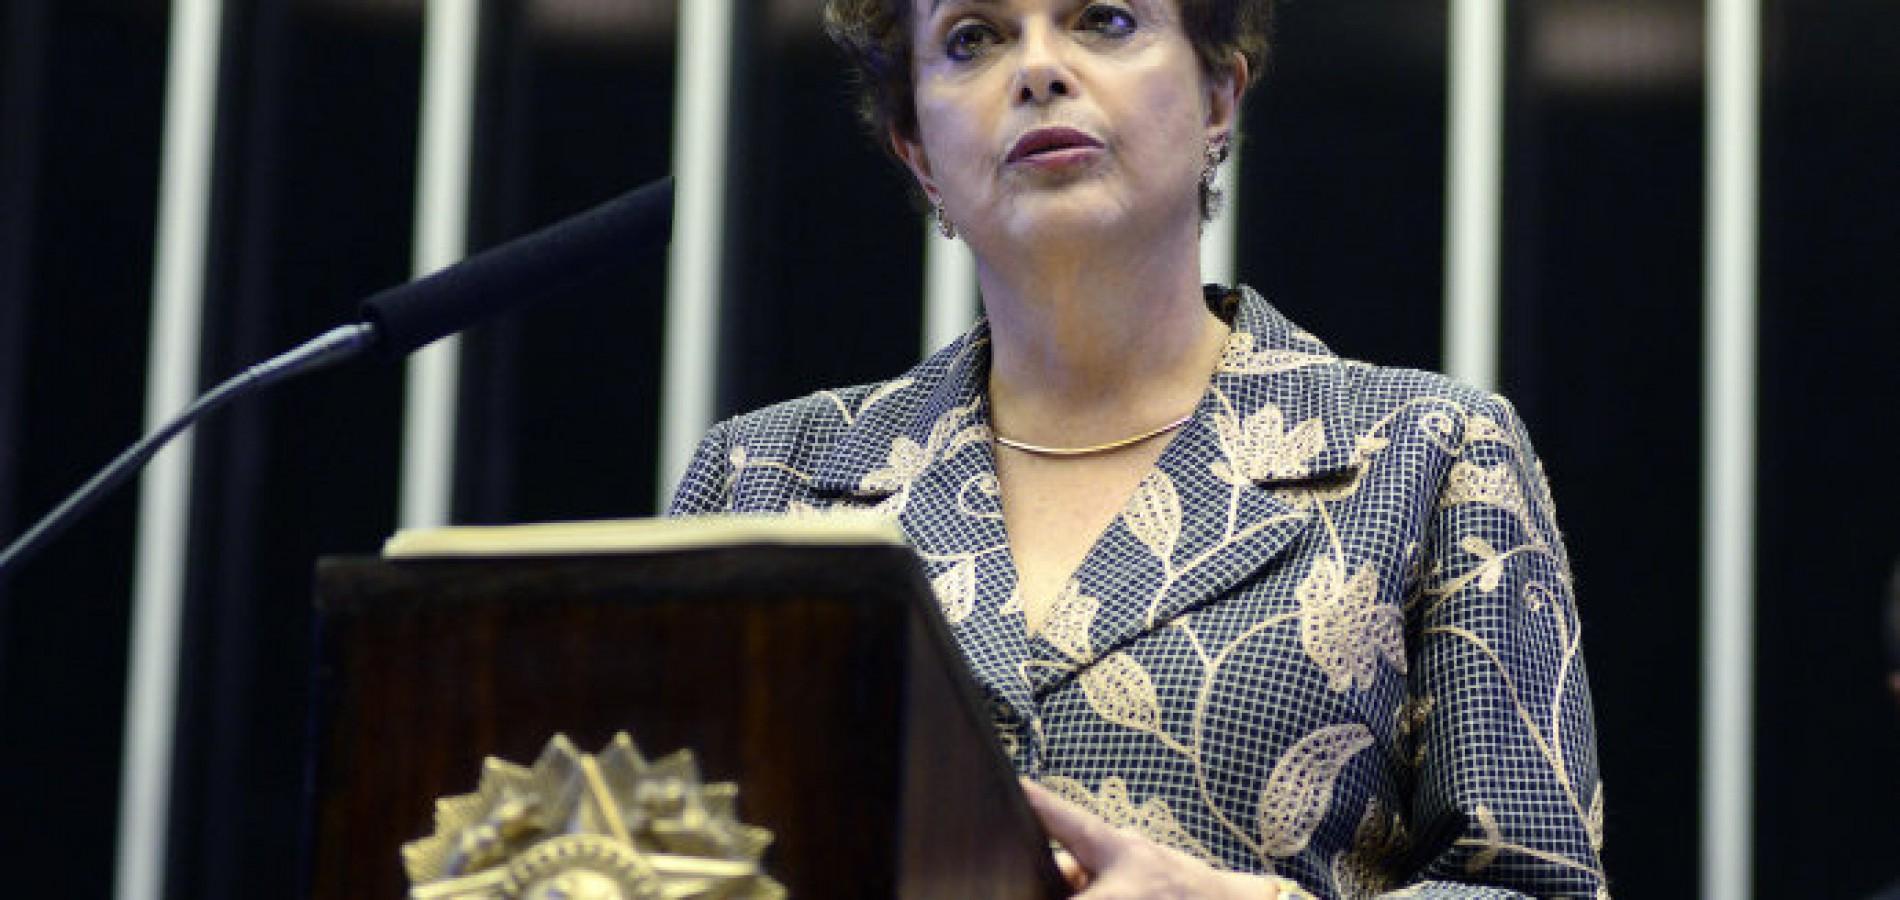 Ao defender a CPMF, Dilma recebe vaias e aplausos no Congresso